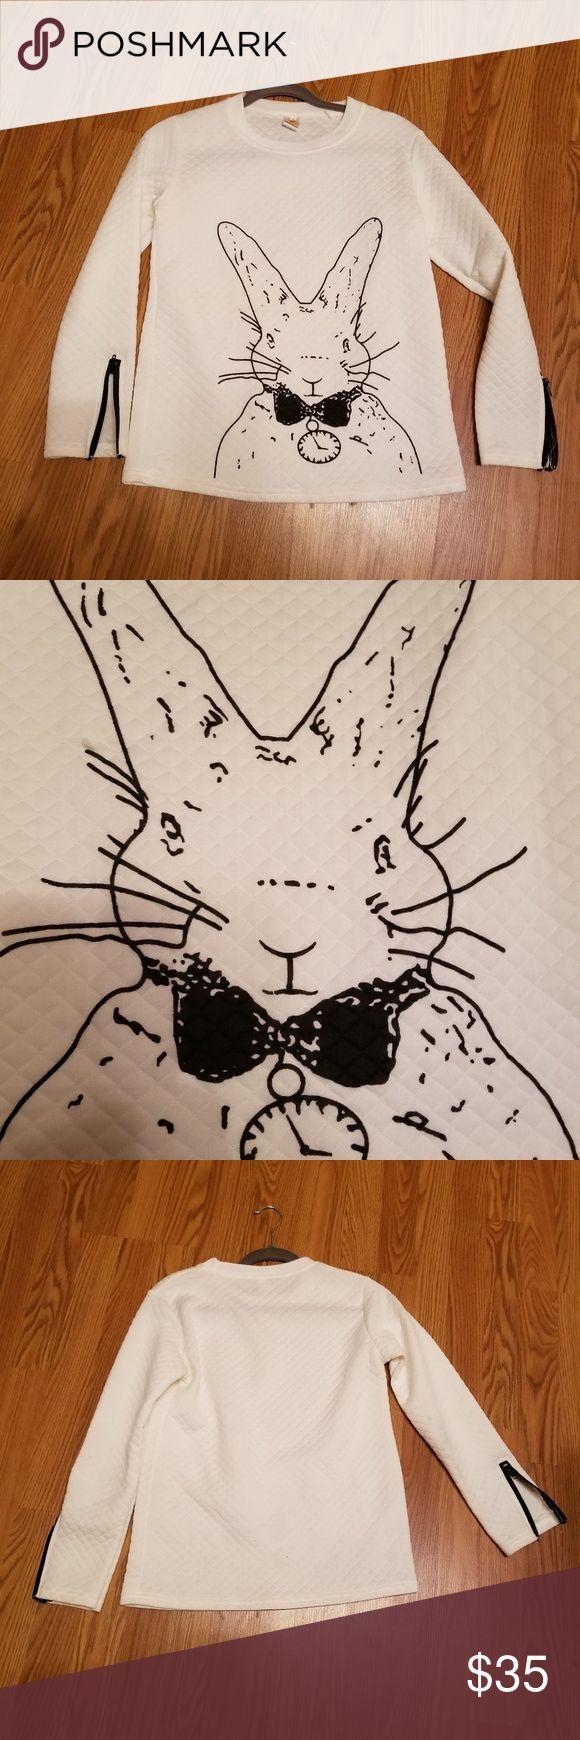 Long sleeves top Alice wonder land rabbit long sleeves top. boutique Tops – #Ali…